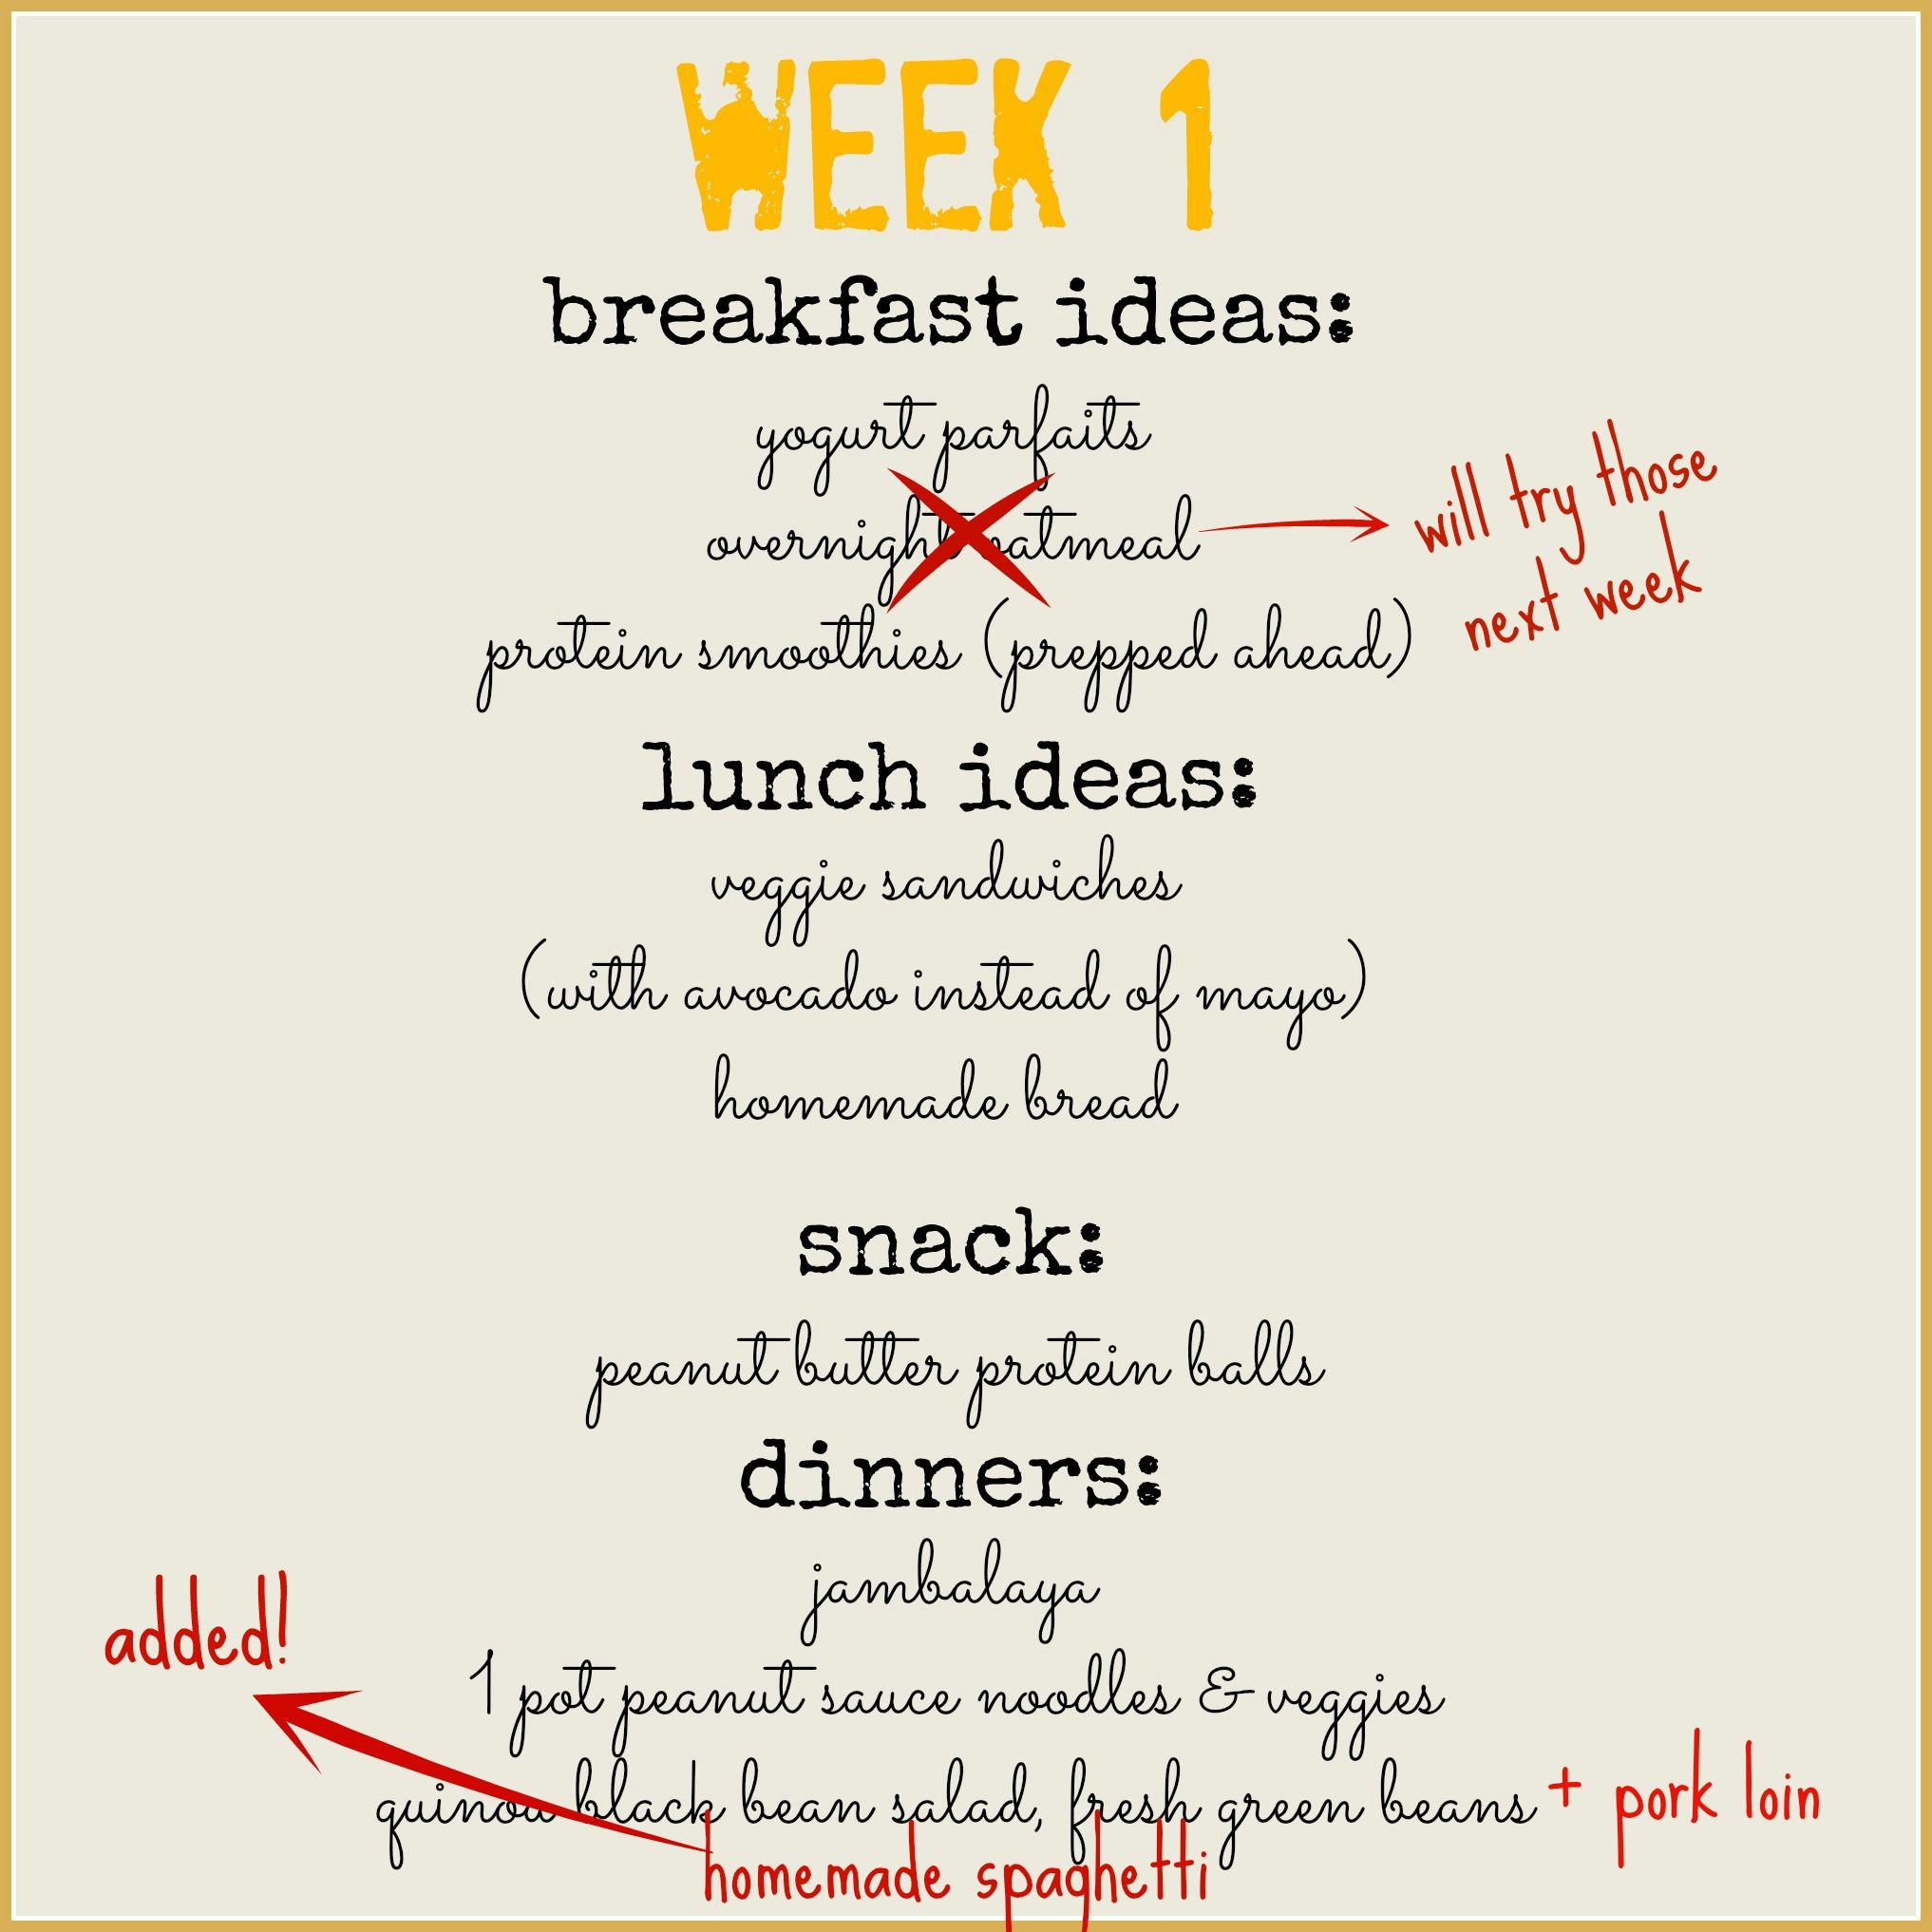 week 1 menu - myfrenchtwist.com